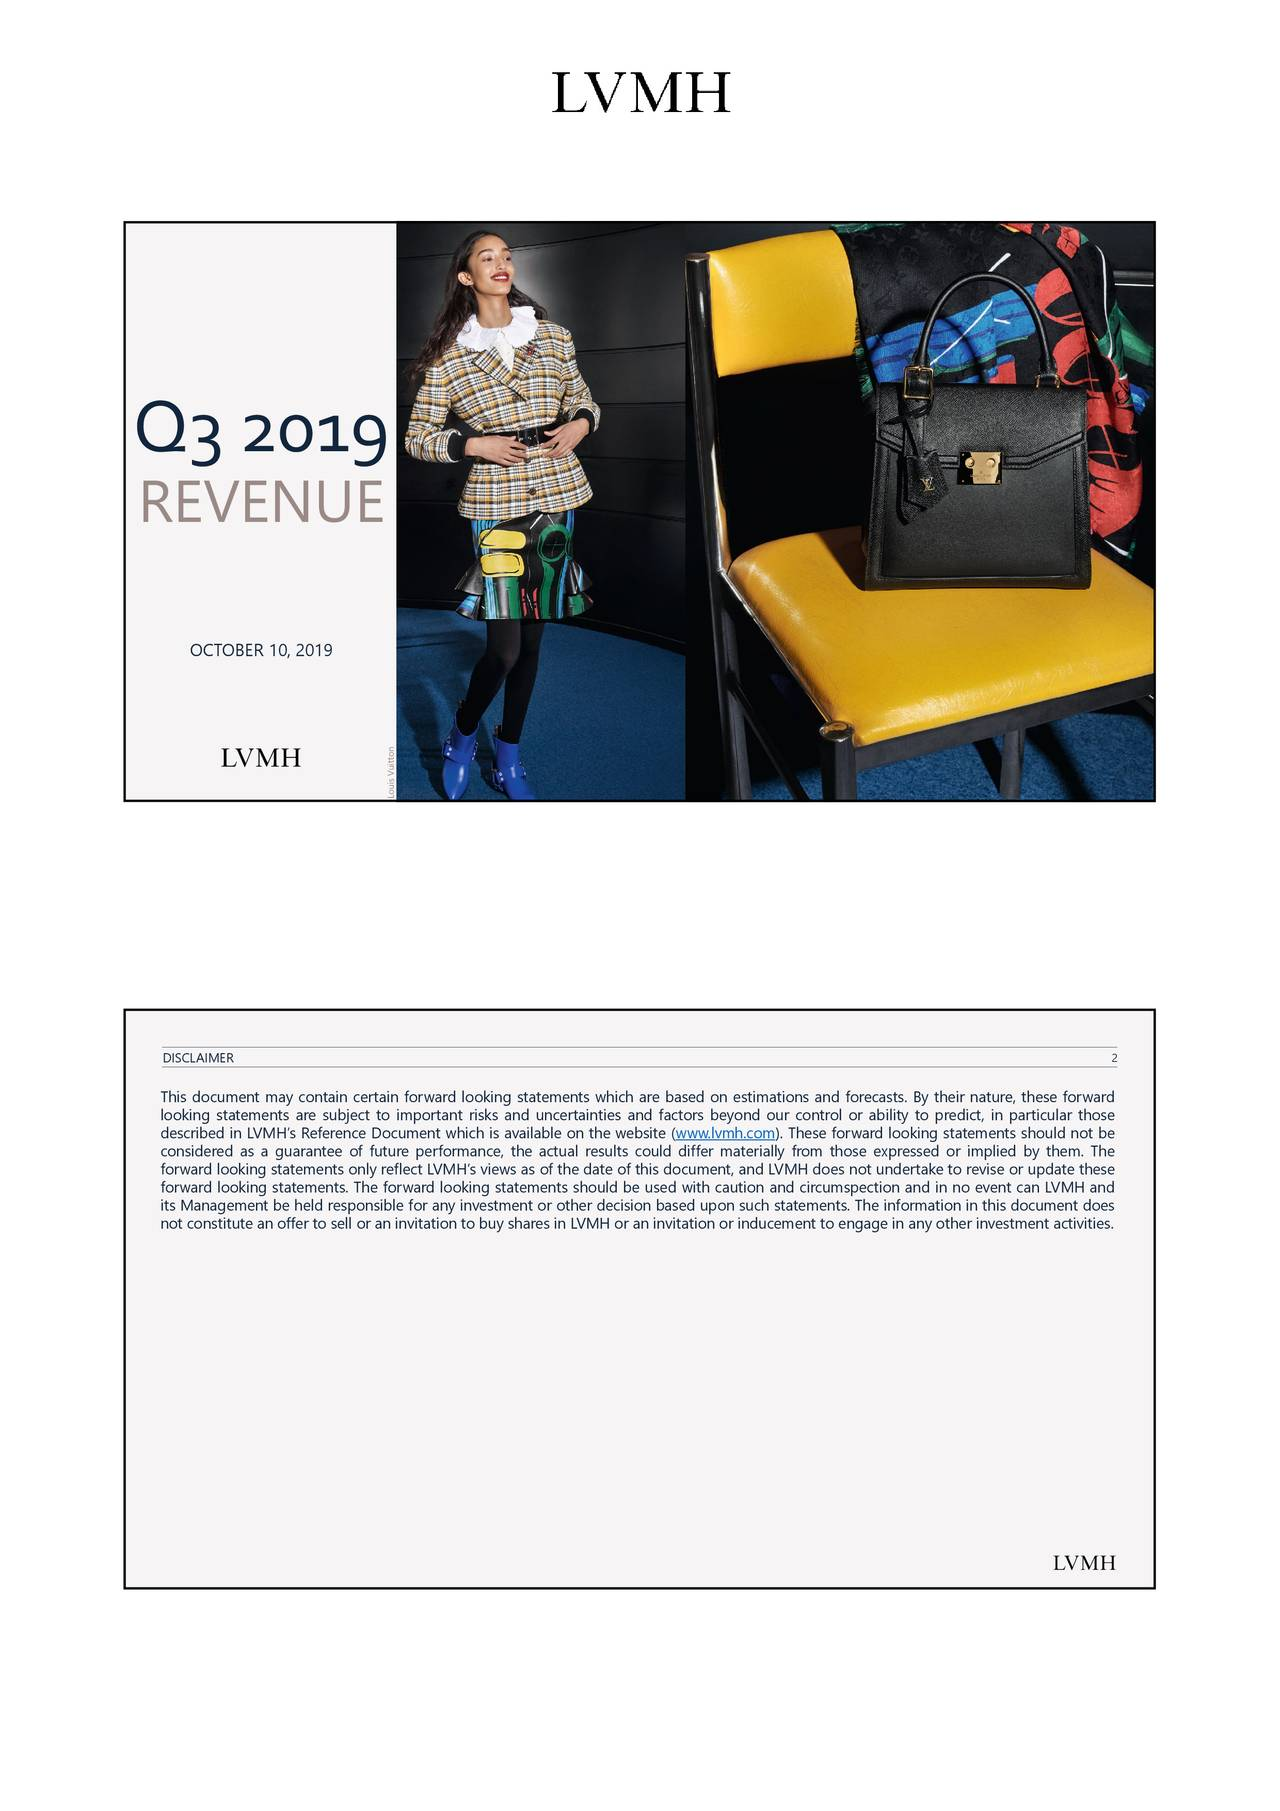 LVMH Moët Hennessy - Louis Vuitton, Société Européenne 2019 Q3 - Results - Earnings Call Presentation